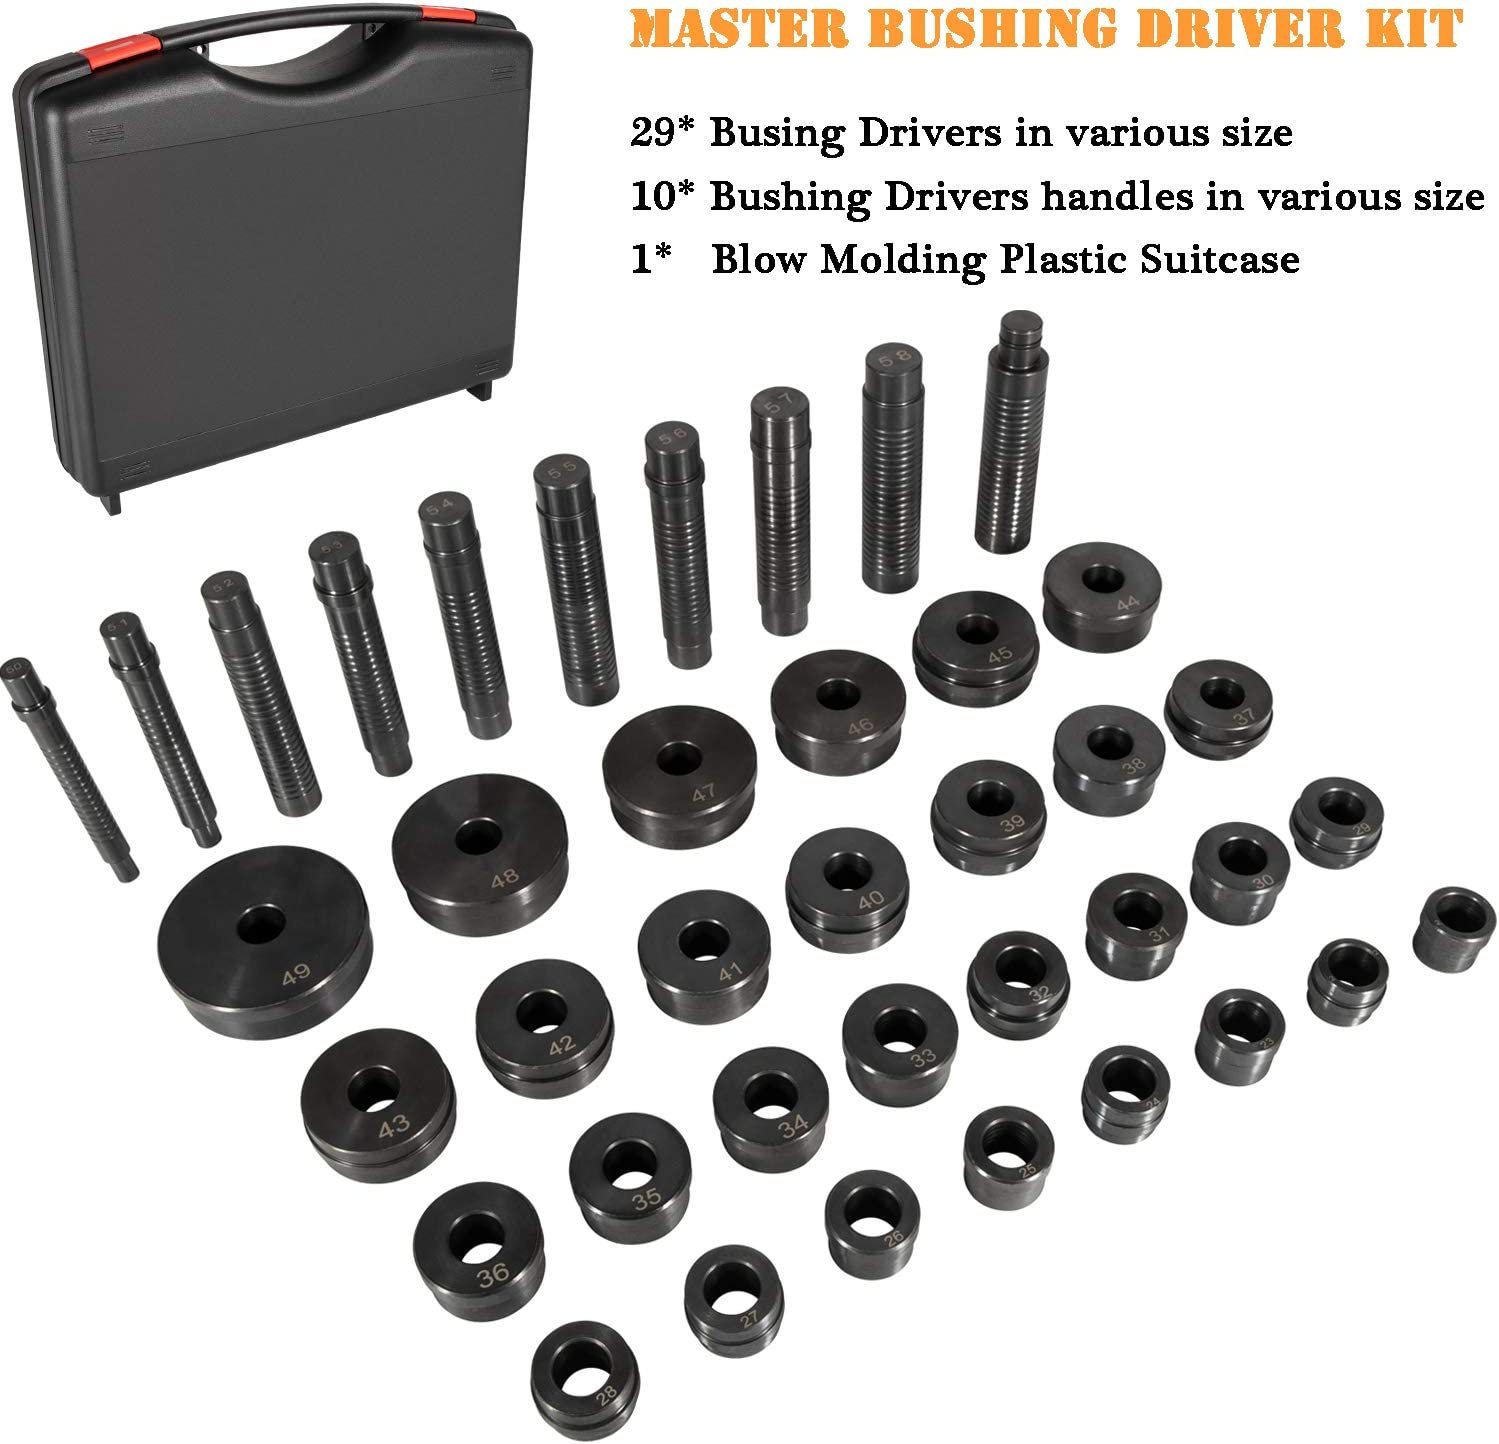 Bushing Bearing Seal Installer Remover Tool Set Sunluway T-0220-39 Master Bushing Driver Set 39pcs fit for Chrysler,GM Ford,Transmissions